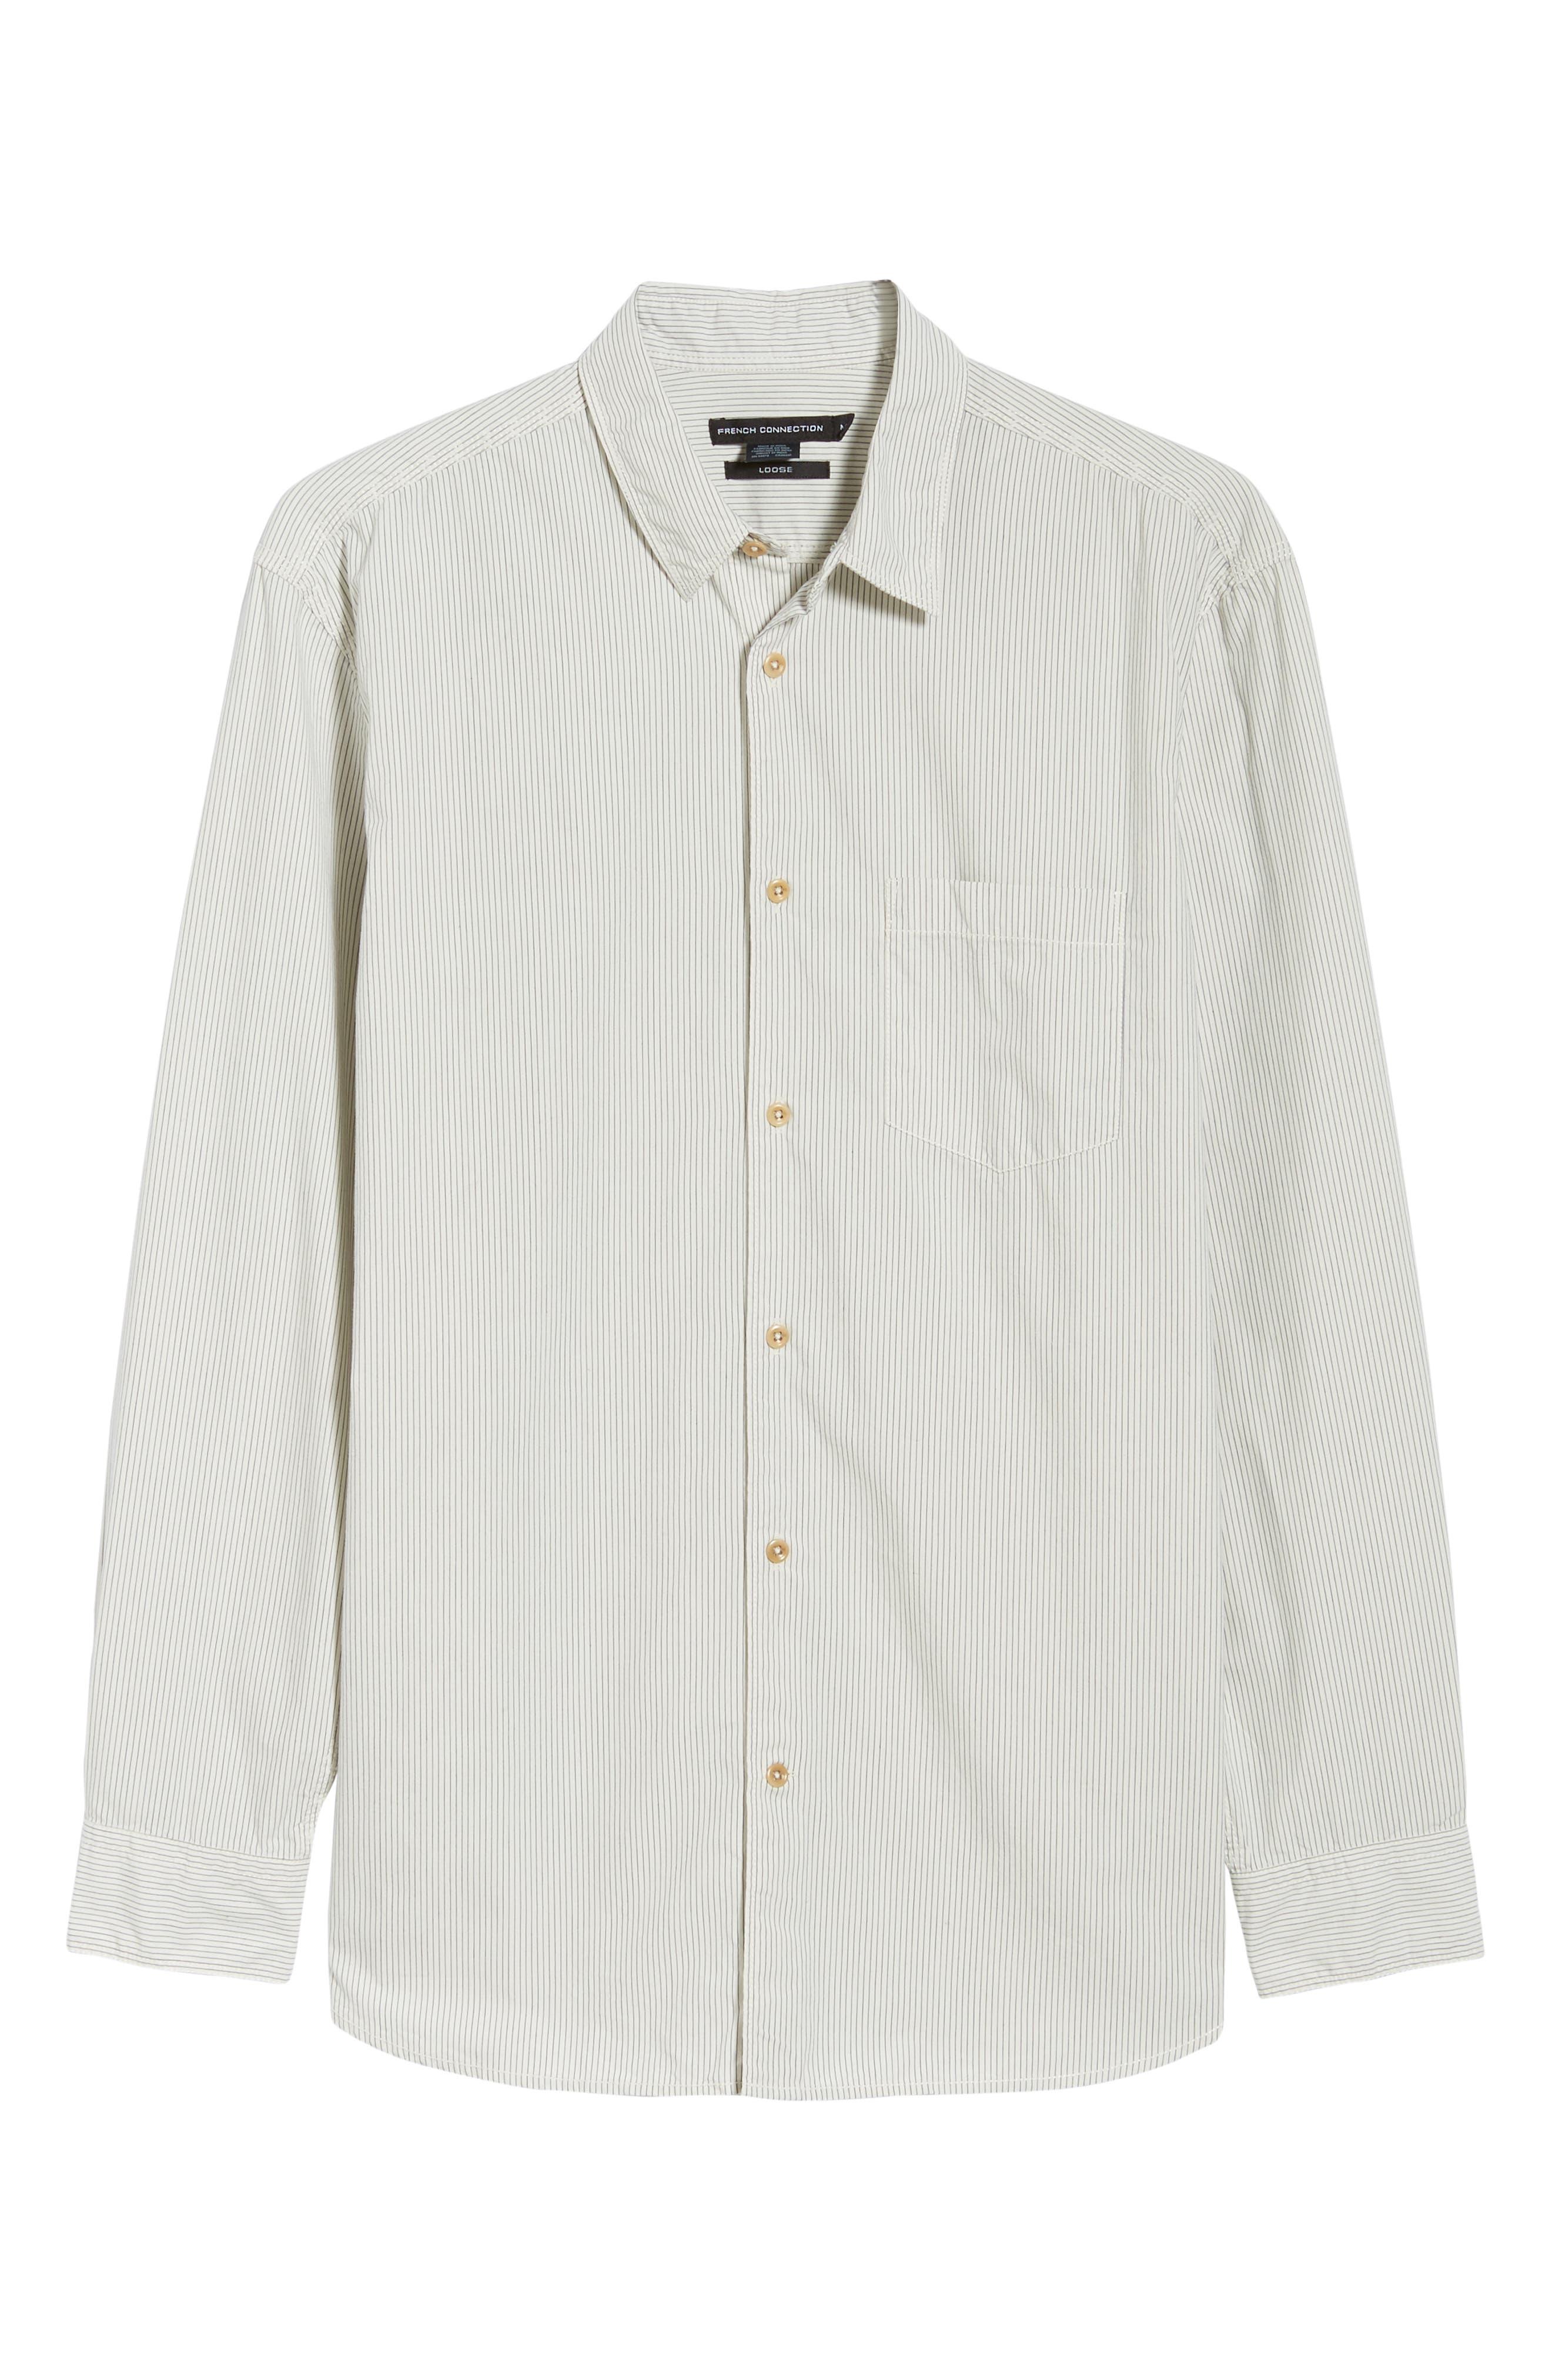 Core Peach Regular Fit Sport Shirt,                             Alternate thumbnail 5, color,                             400